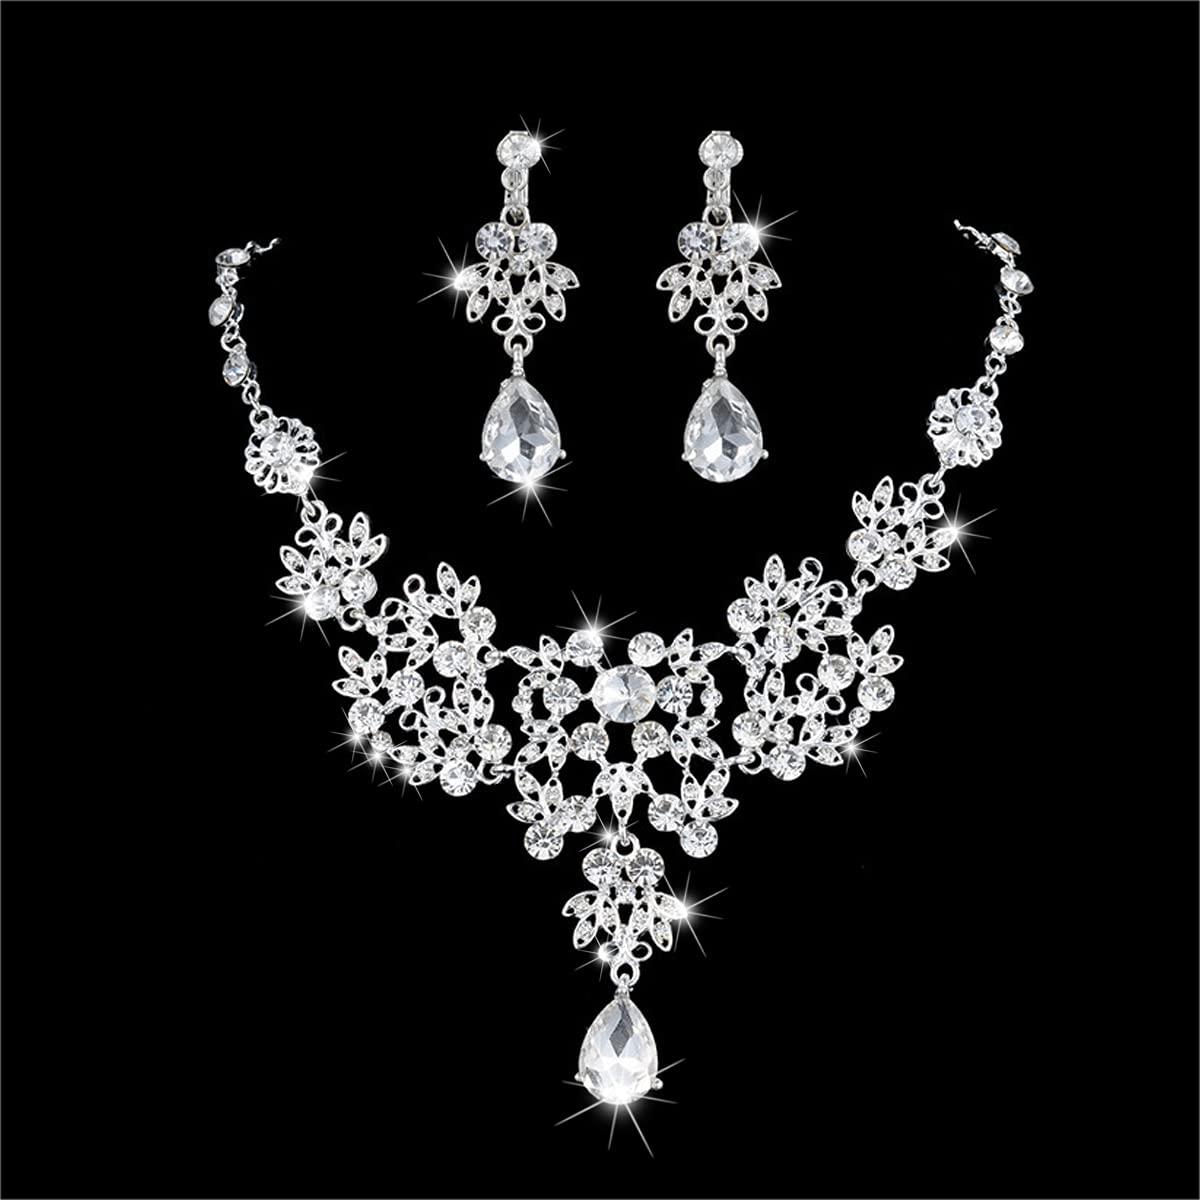 Sepniell Bridal Jewelry Sets Wedding Rhinestone Necklace Set for Women Bridesmaid Jewelry Set for Wedding